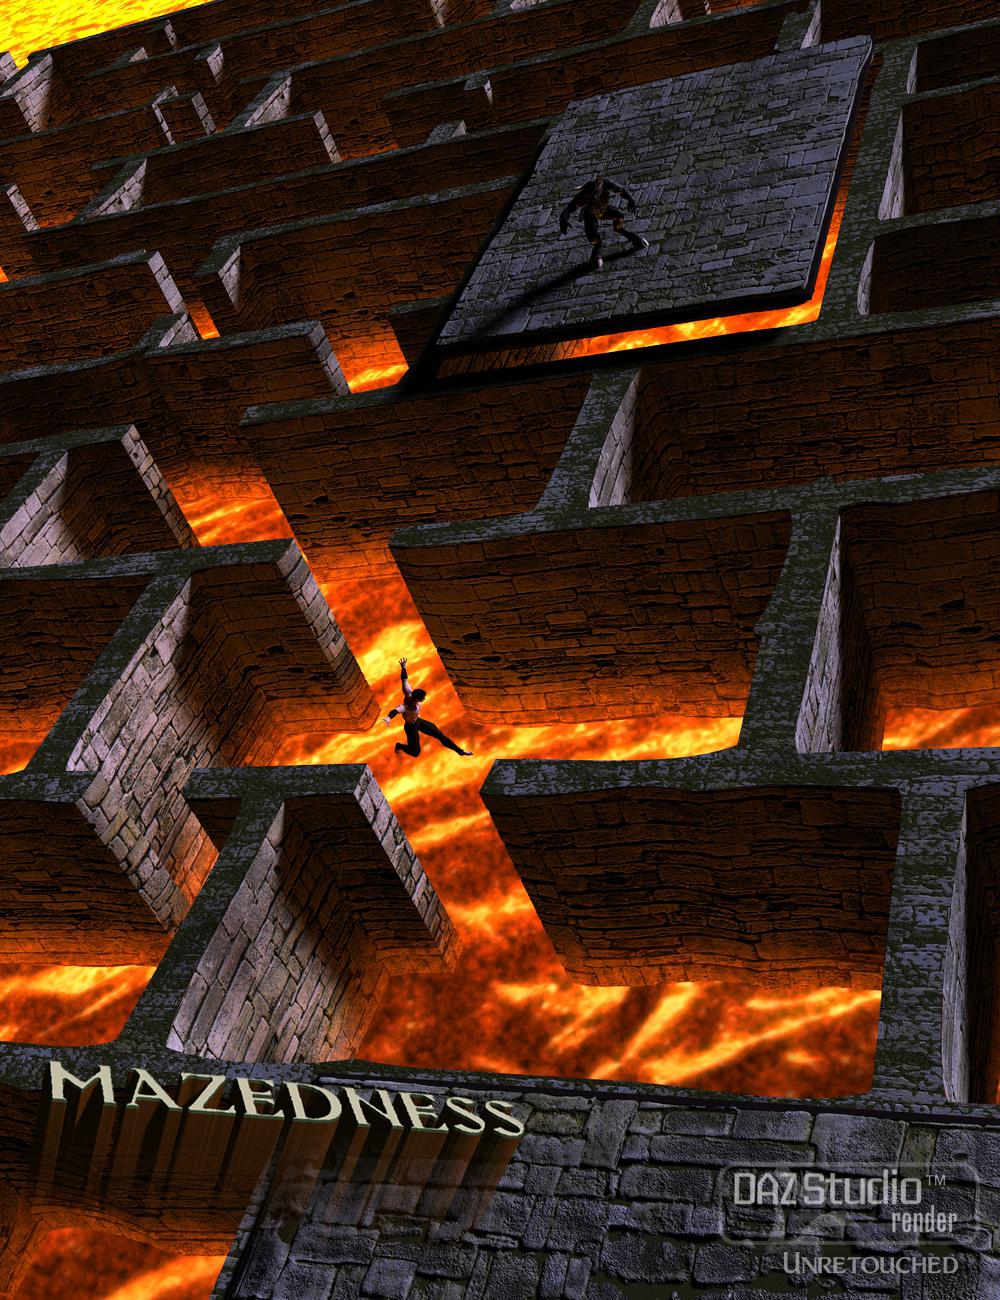 Mazedness for DAZ Studio by: Marshian, 3D Models by Daz 3D